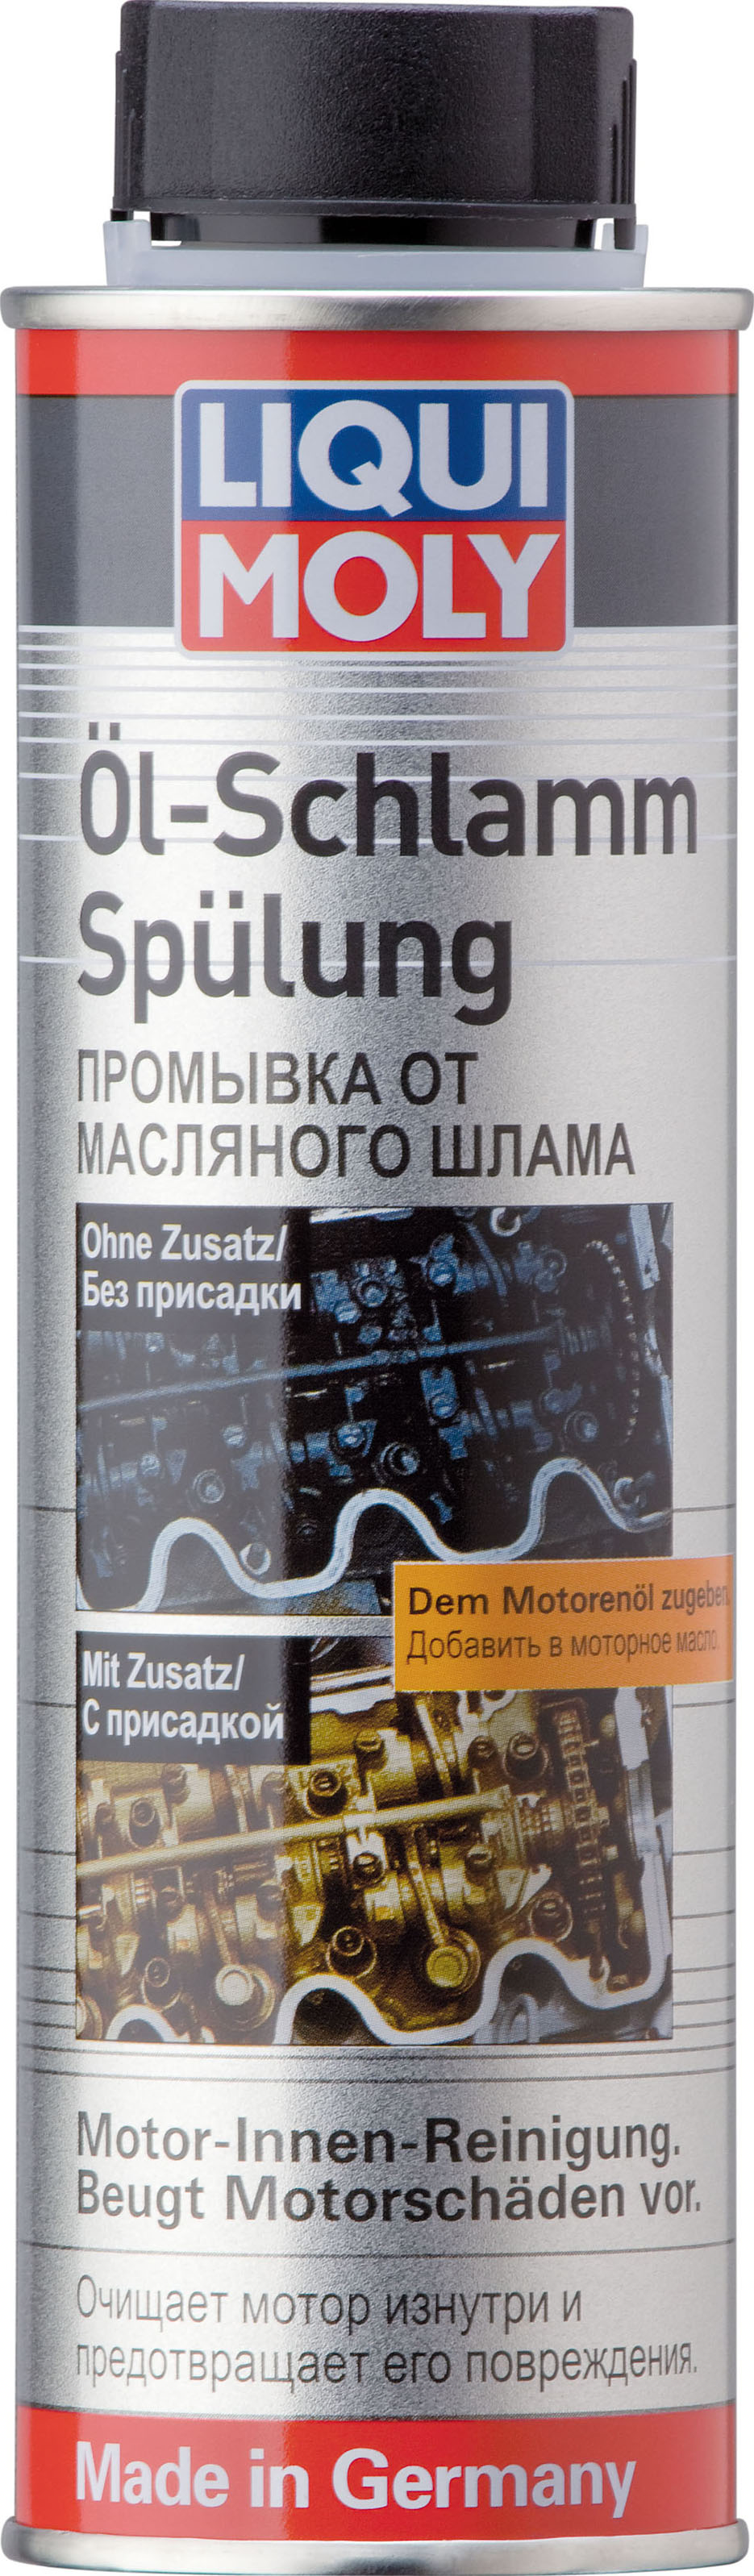 Промывка от масляного шлама Oil-Schlamm-Spulung